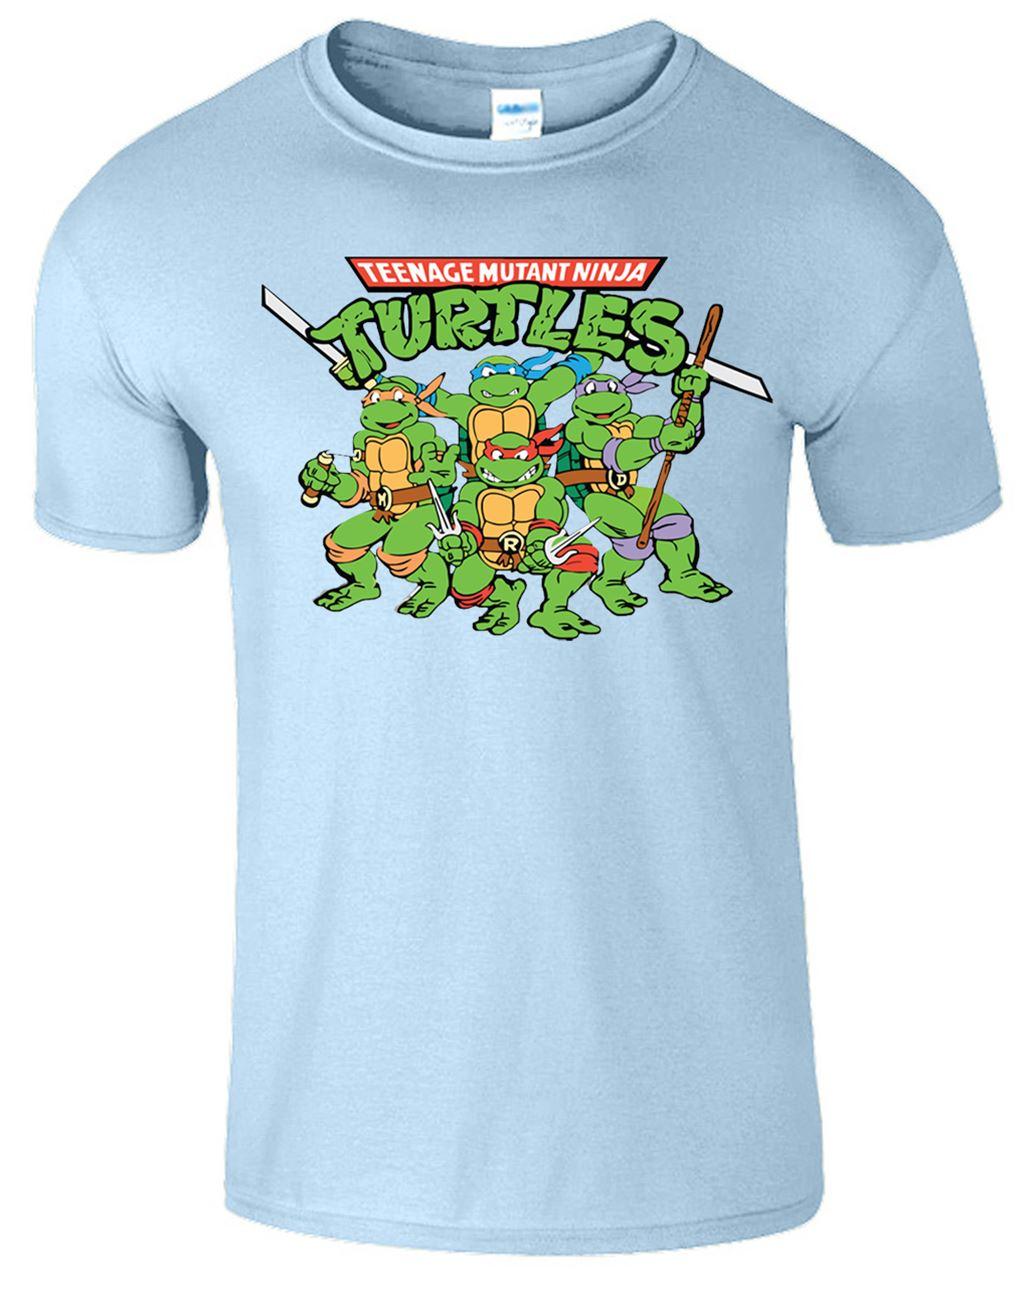 Teenage mutant ninja turtles mens t shirt tmnt retro 90 39 s for Turtle shirts for men